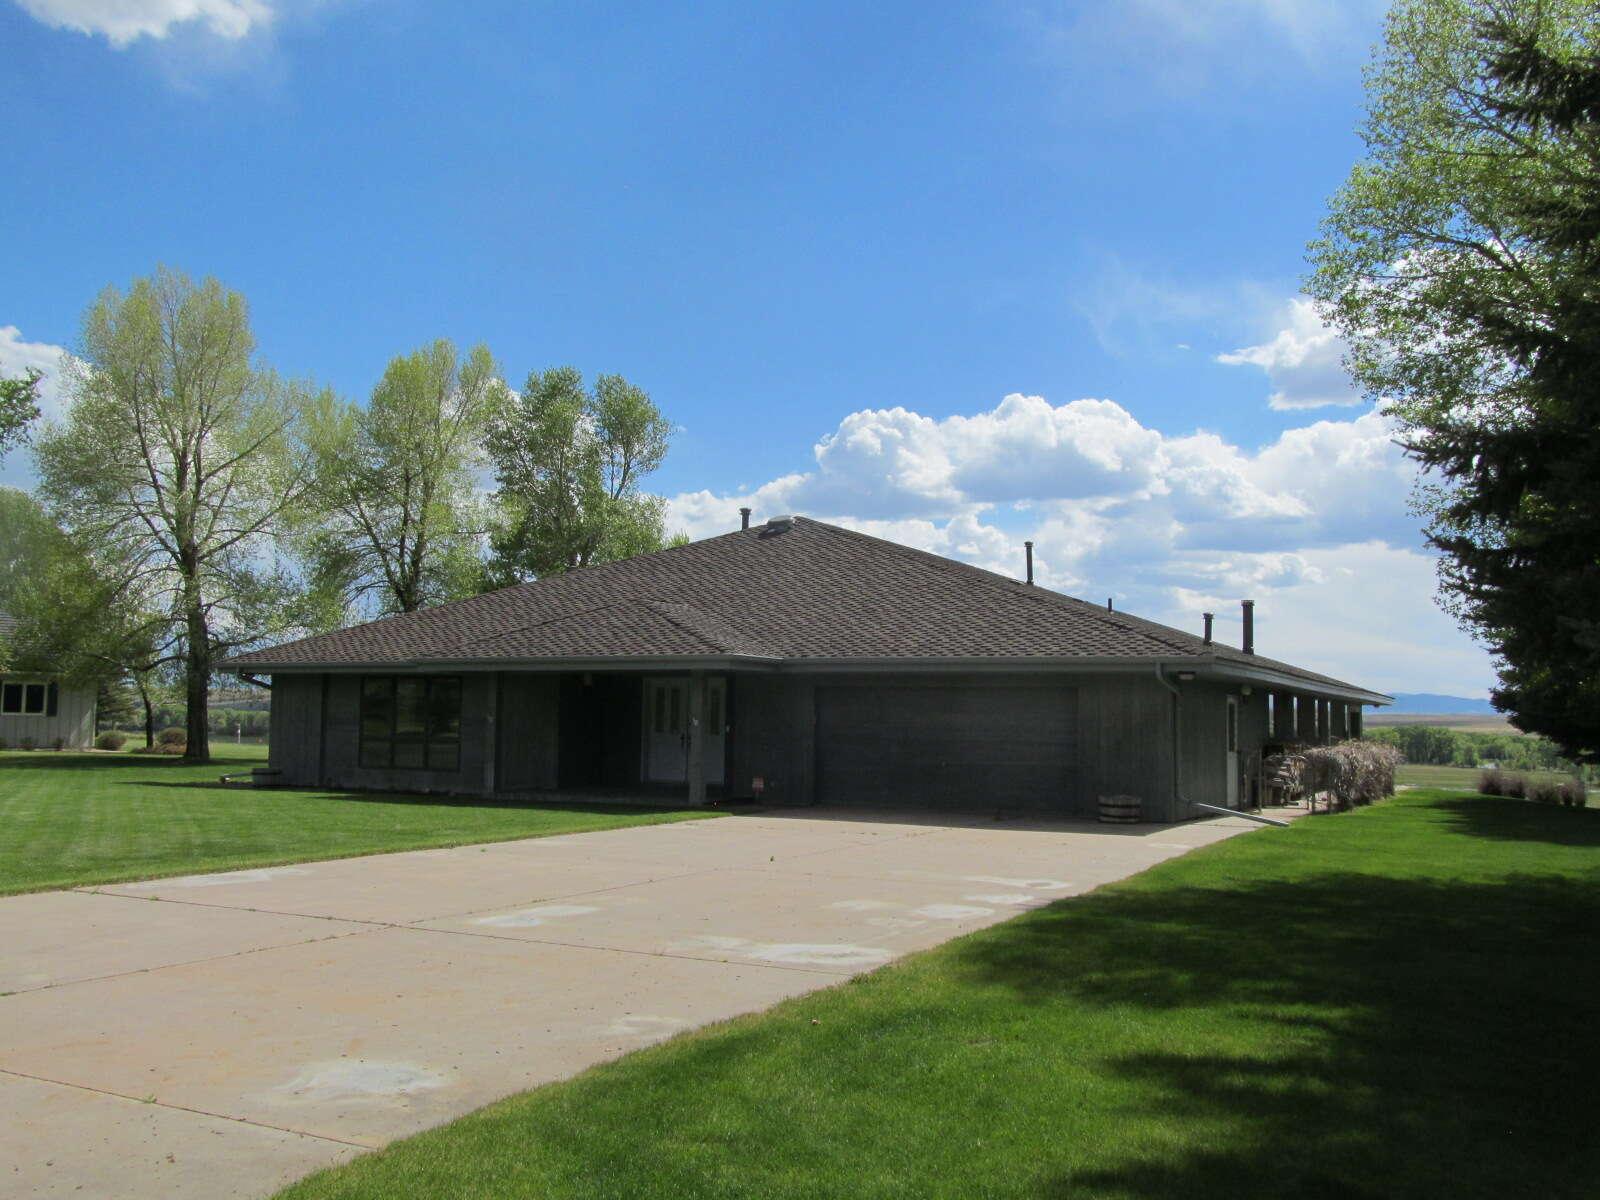 Single Family for Sale at 112 Arapahoe Drive Saratoga, Wyoming 82331 United States